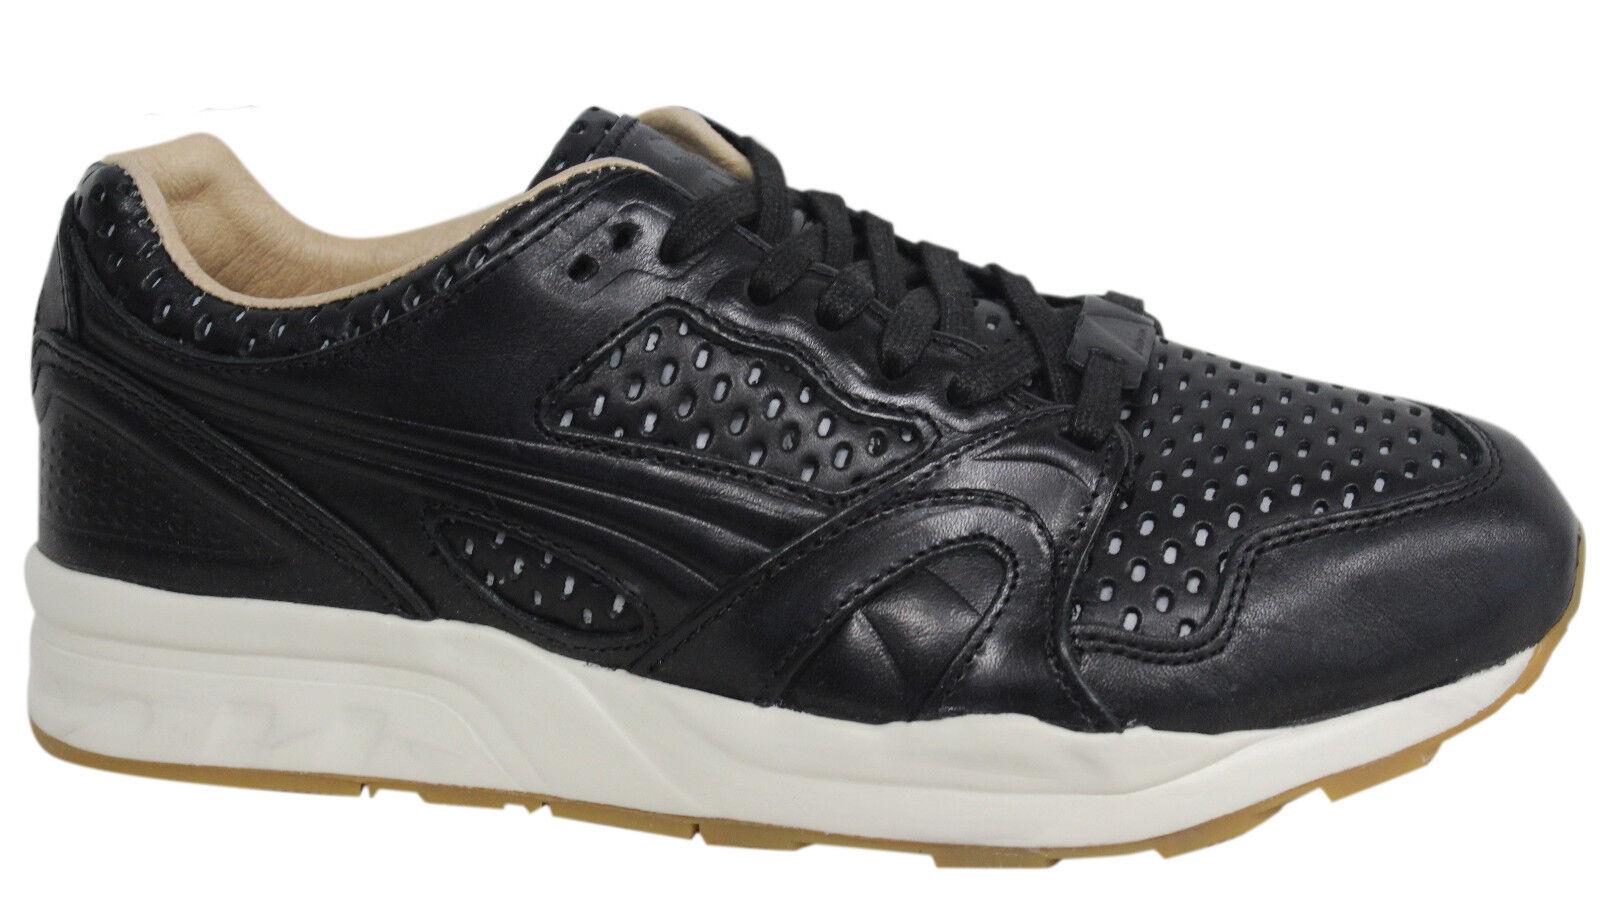 Puma Trinomic XT+ Leather Lace Up Mens Black Trainers 358822 01 D109